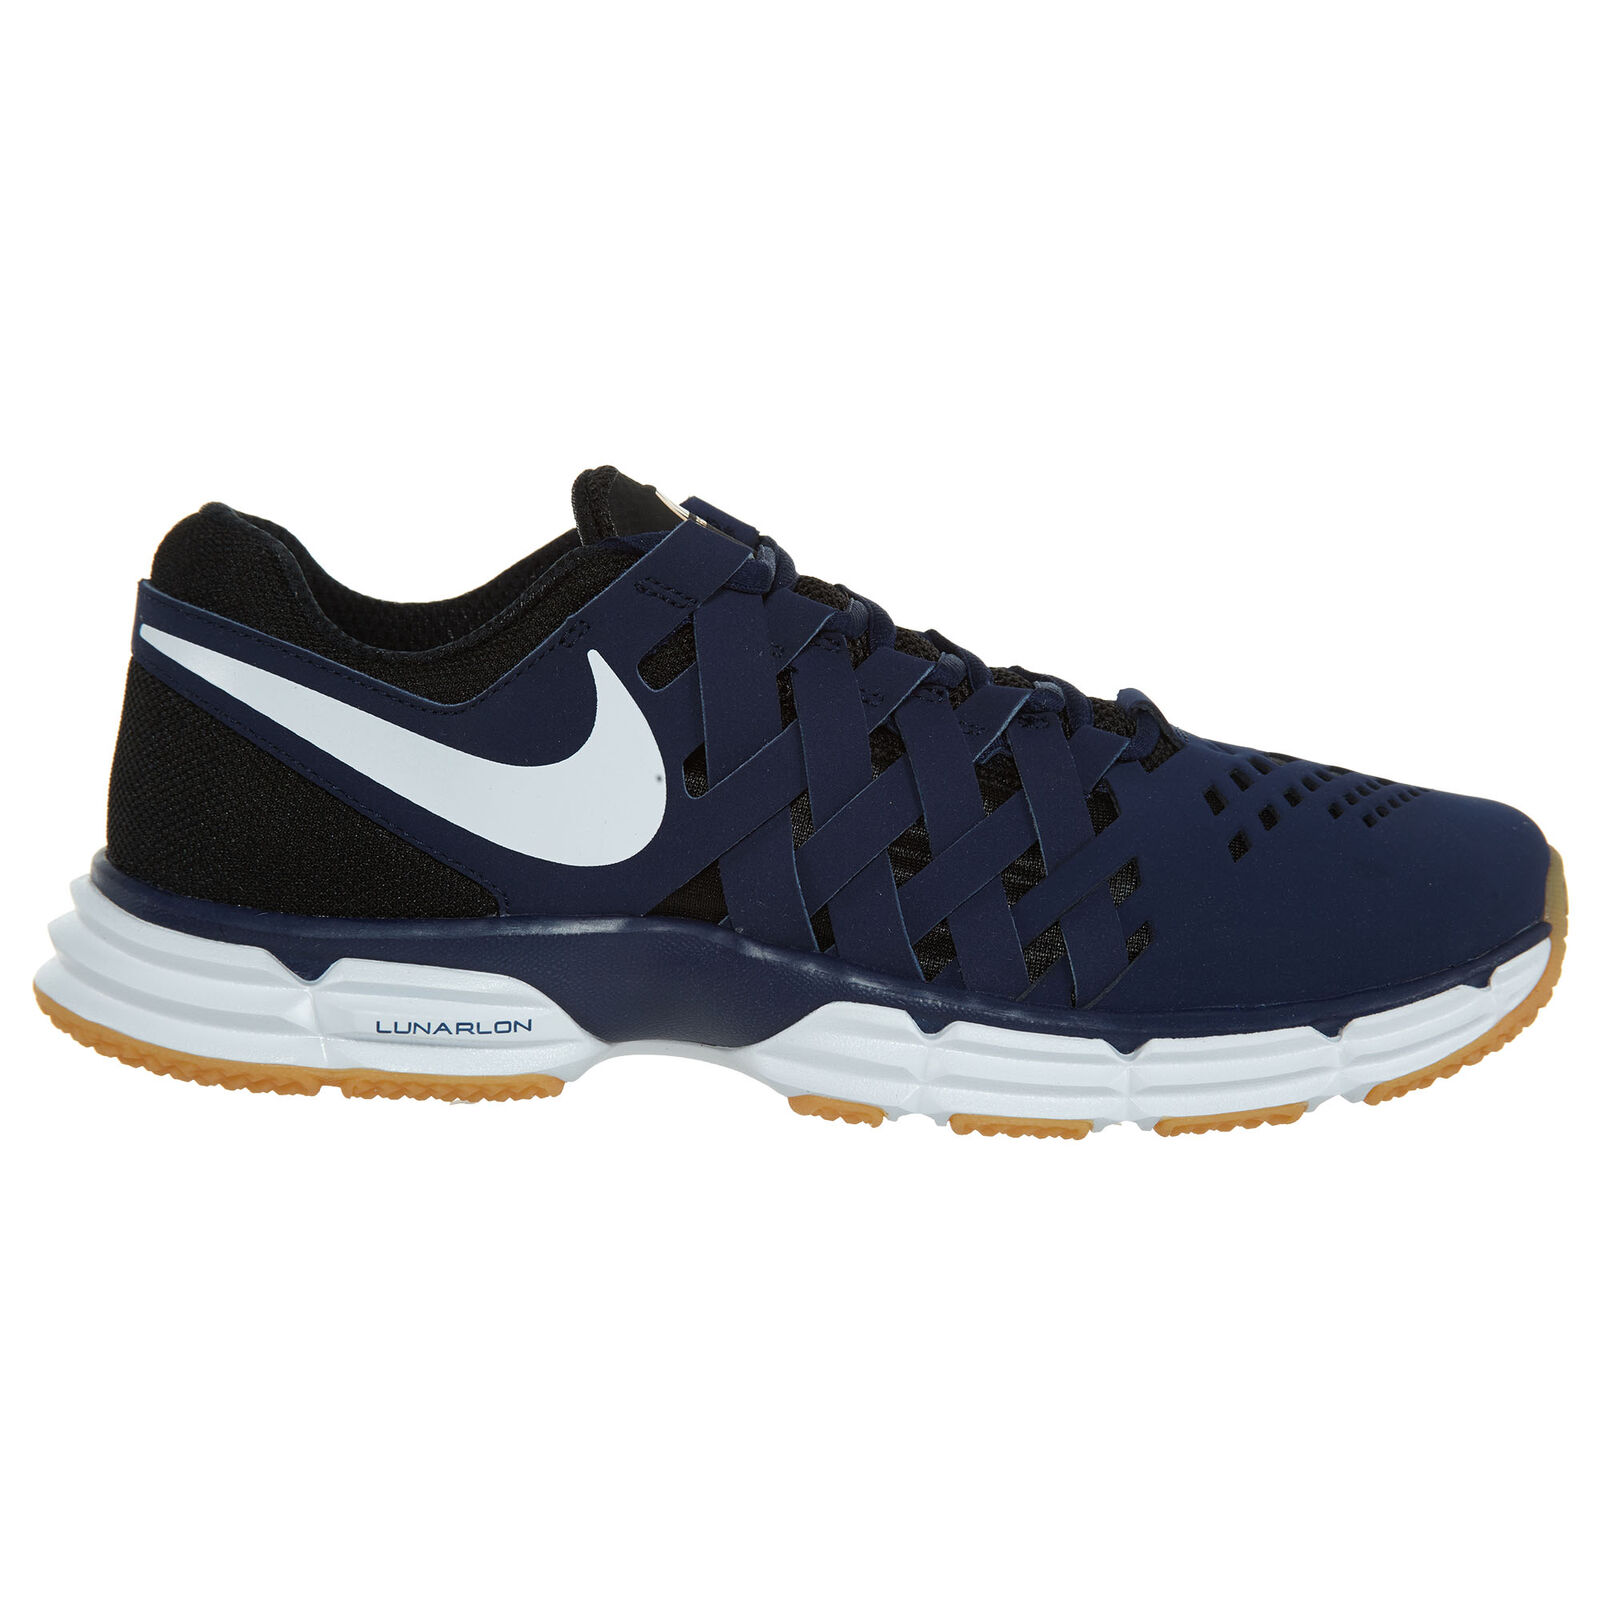 Nike Lunar Fingertrap TR 898066-414 Binary Blue White Gum Training Shoes Comfortable